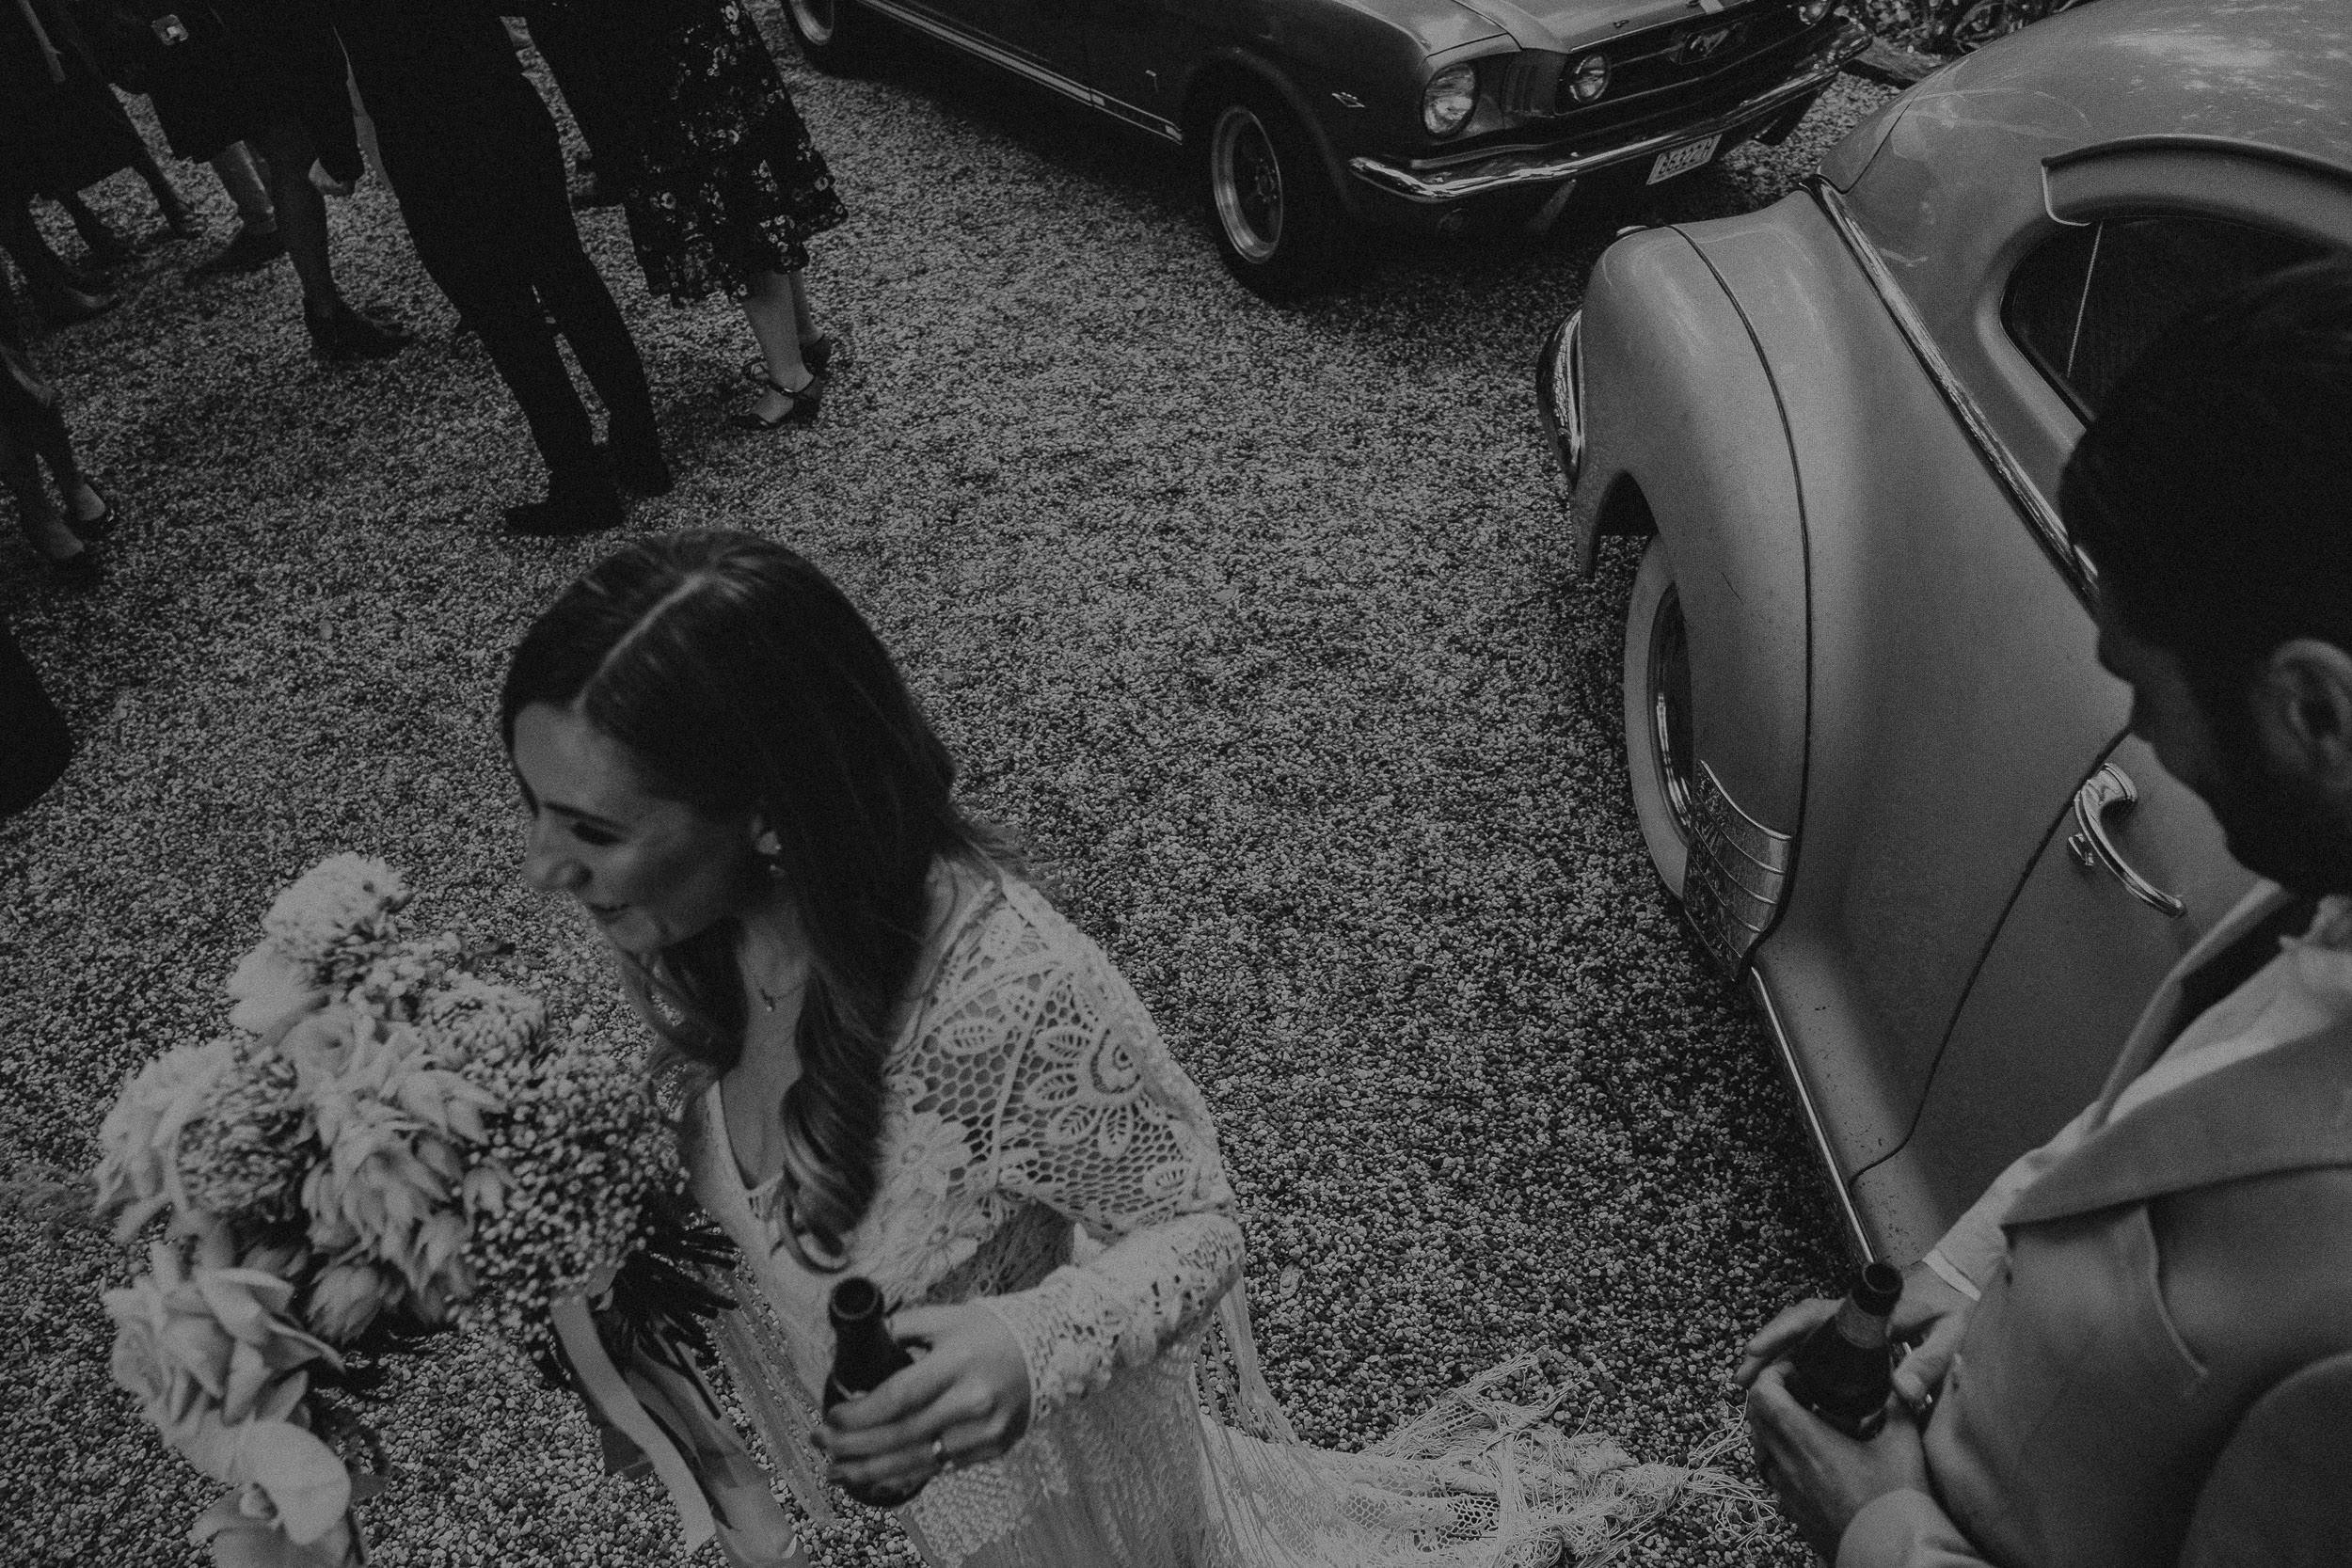 S&A Elopement - Kings & Thieves - Shred 'Til Dead - Central Coast Beach Forest Wedding - 330.jpg